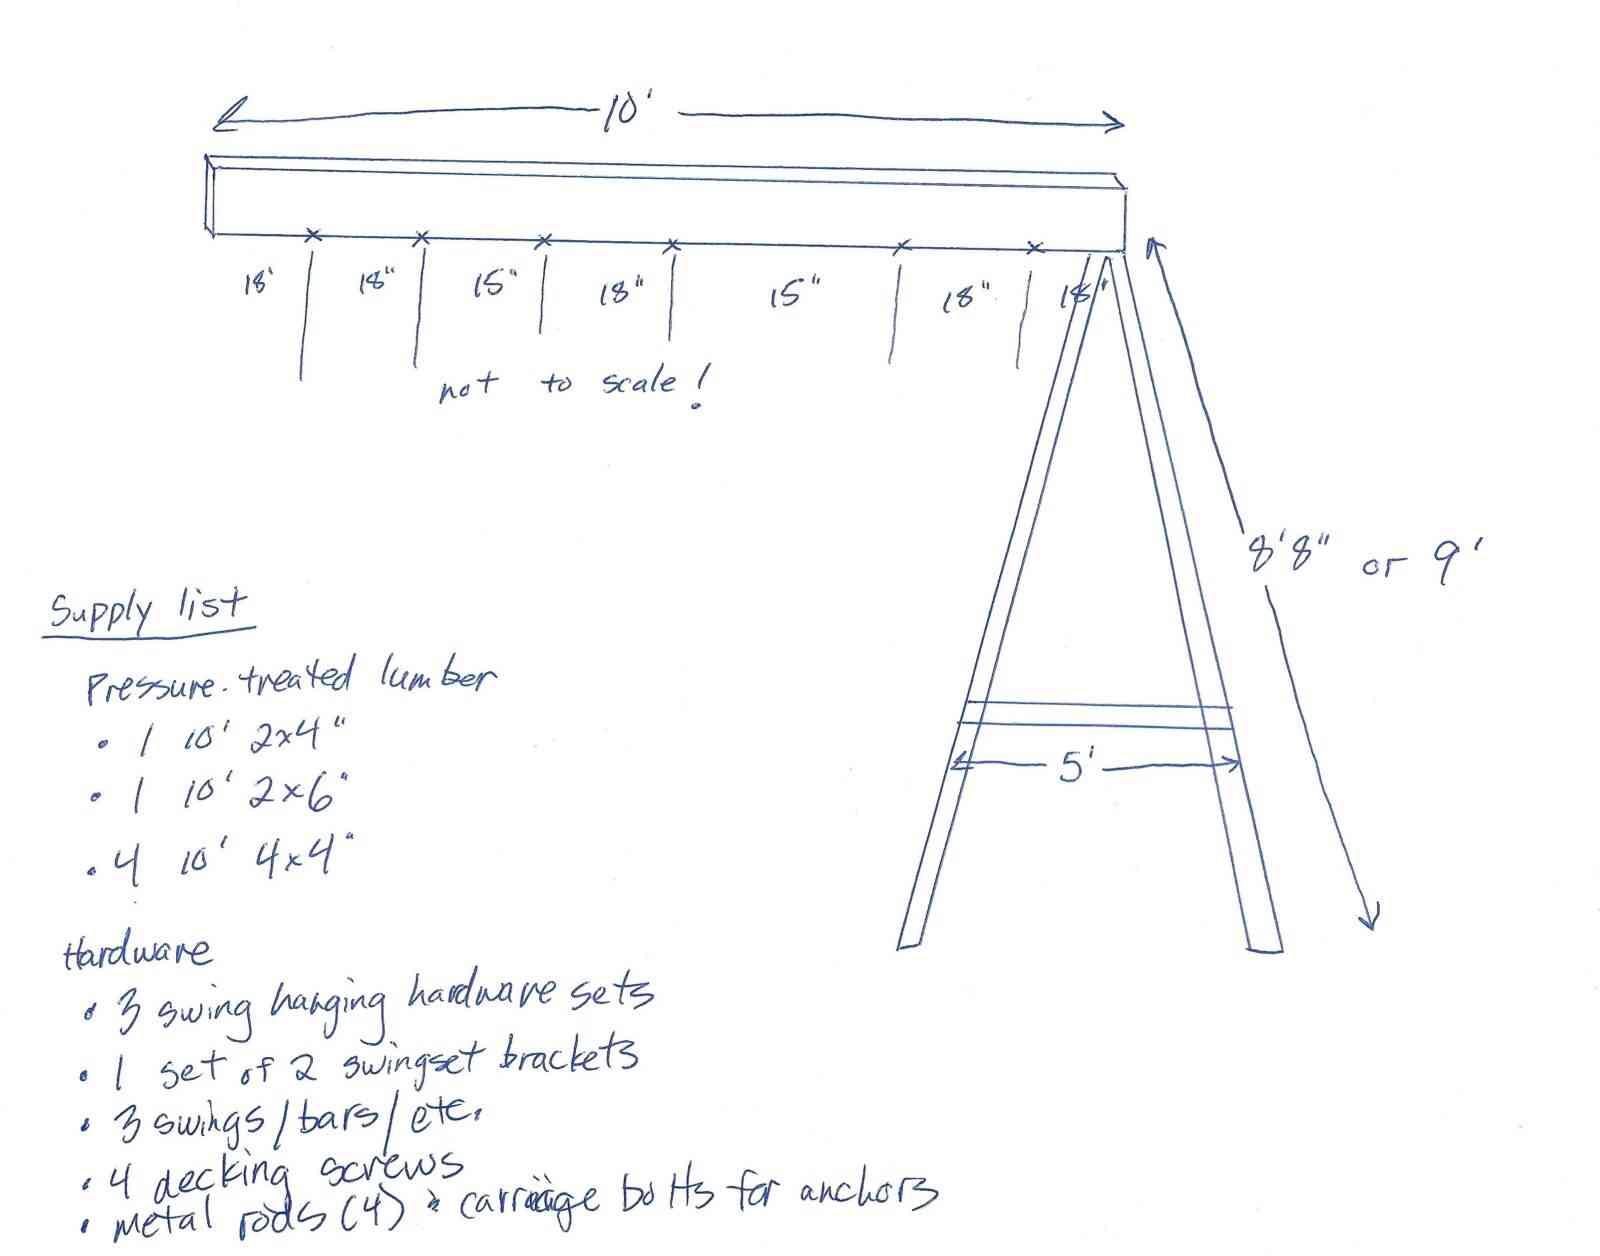 free DIY wooden swing set plans hand drawn